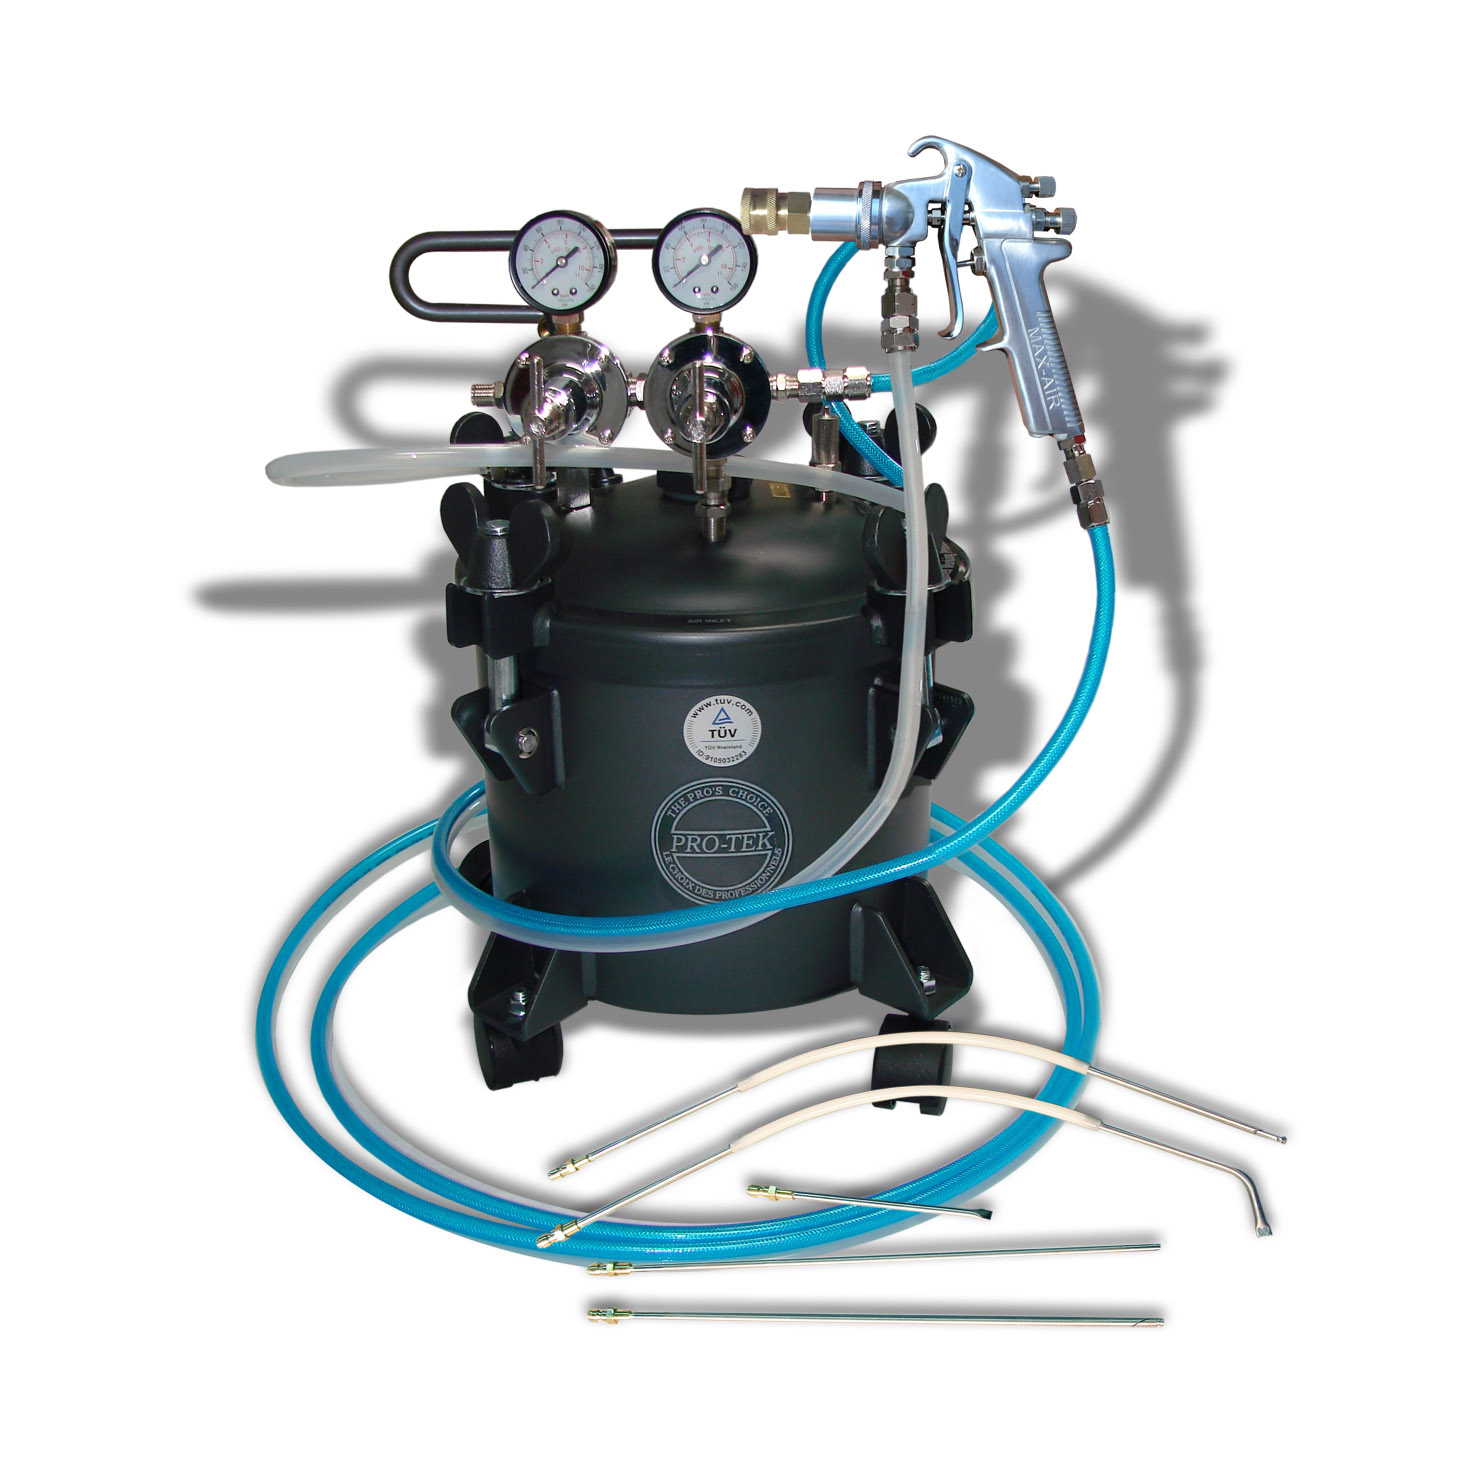 2 1 2 Gal Undercoating System Pro Teksprayequipment Com